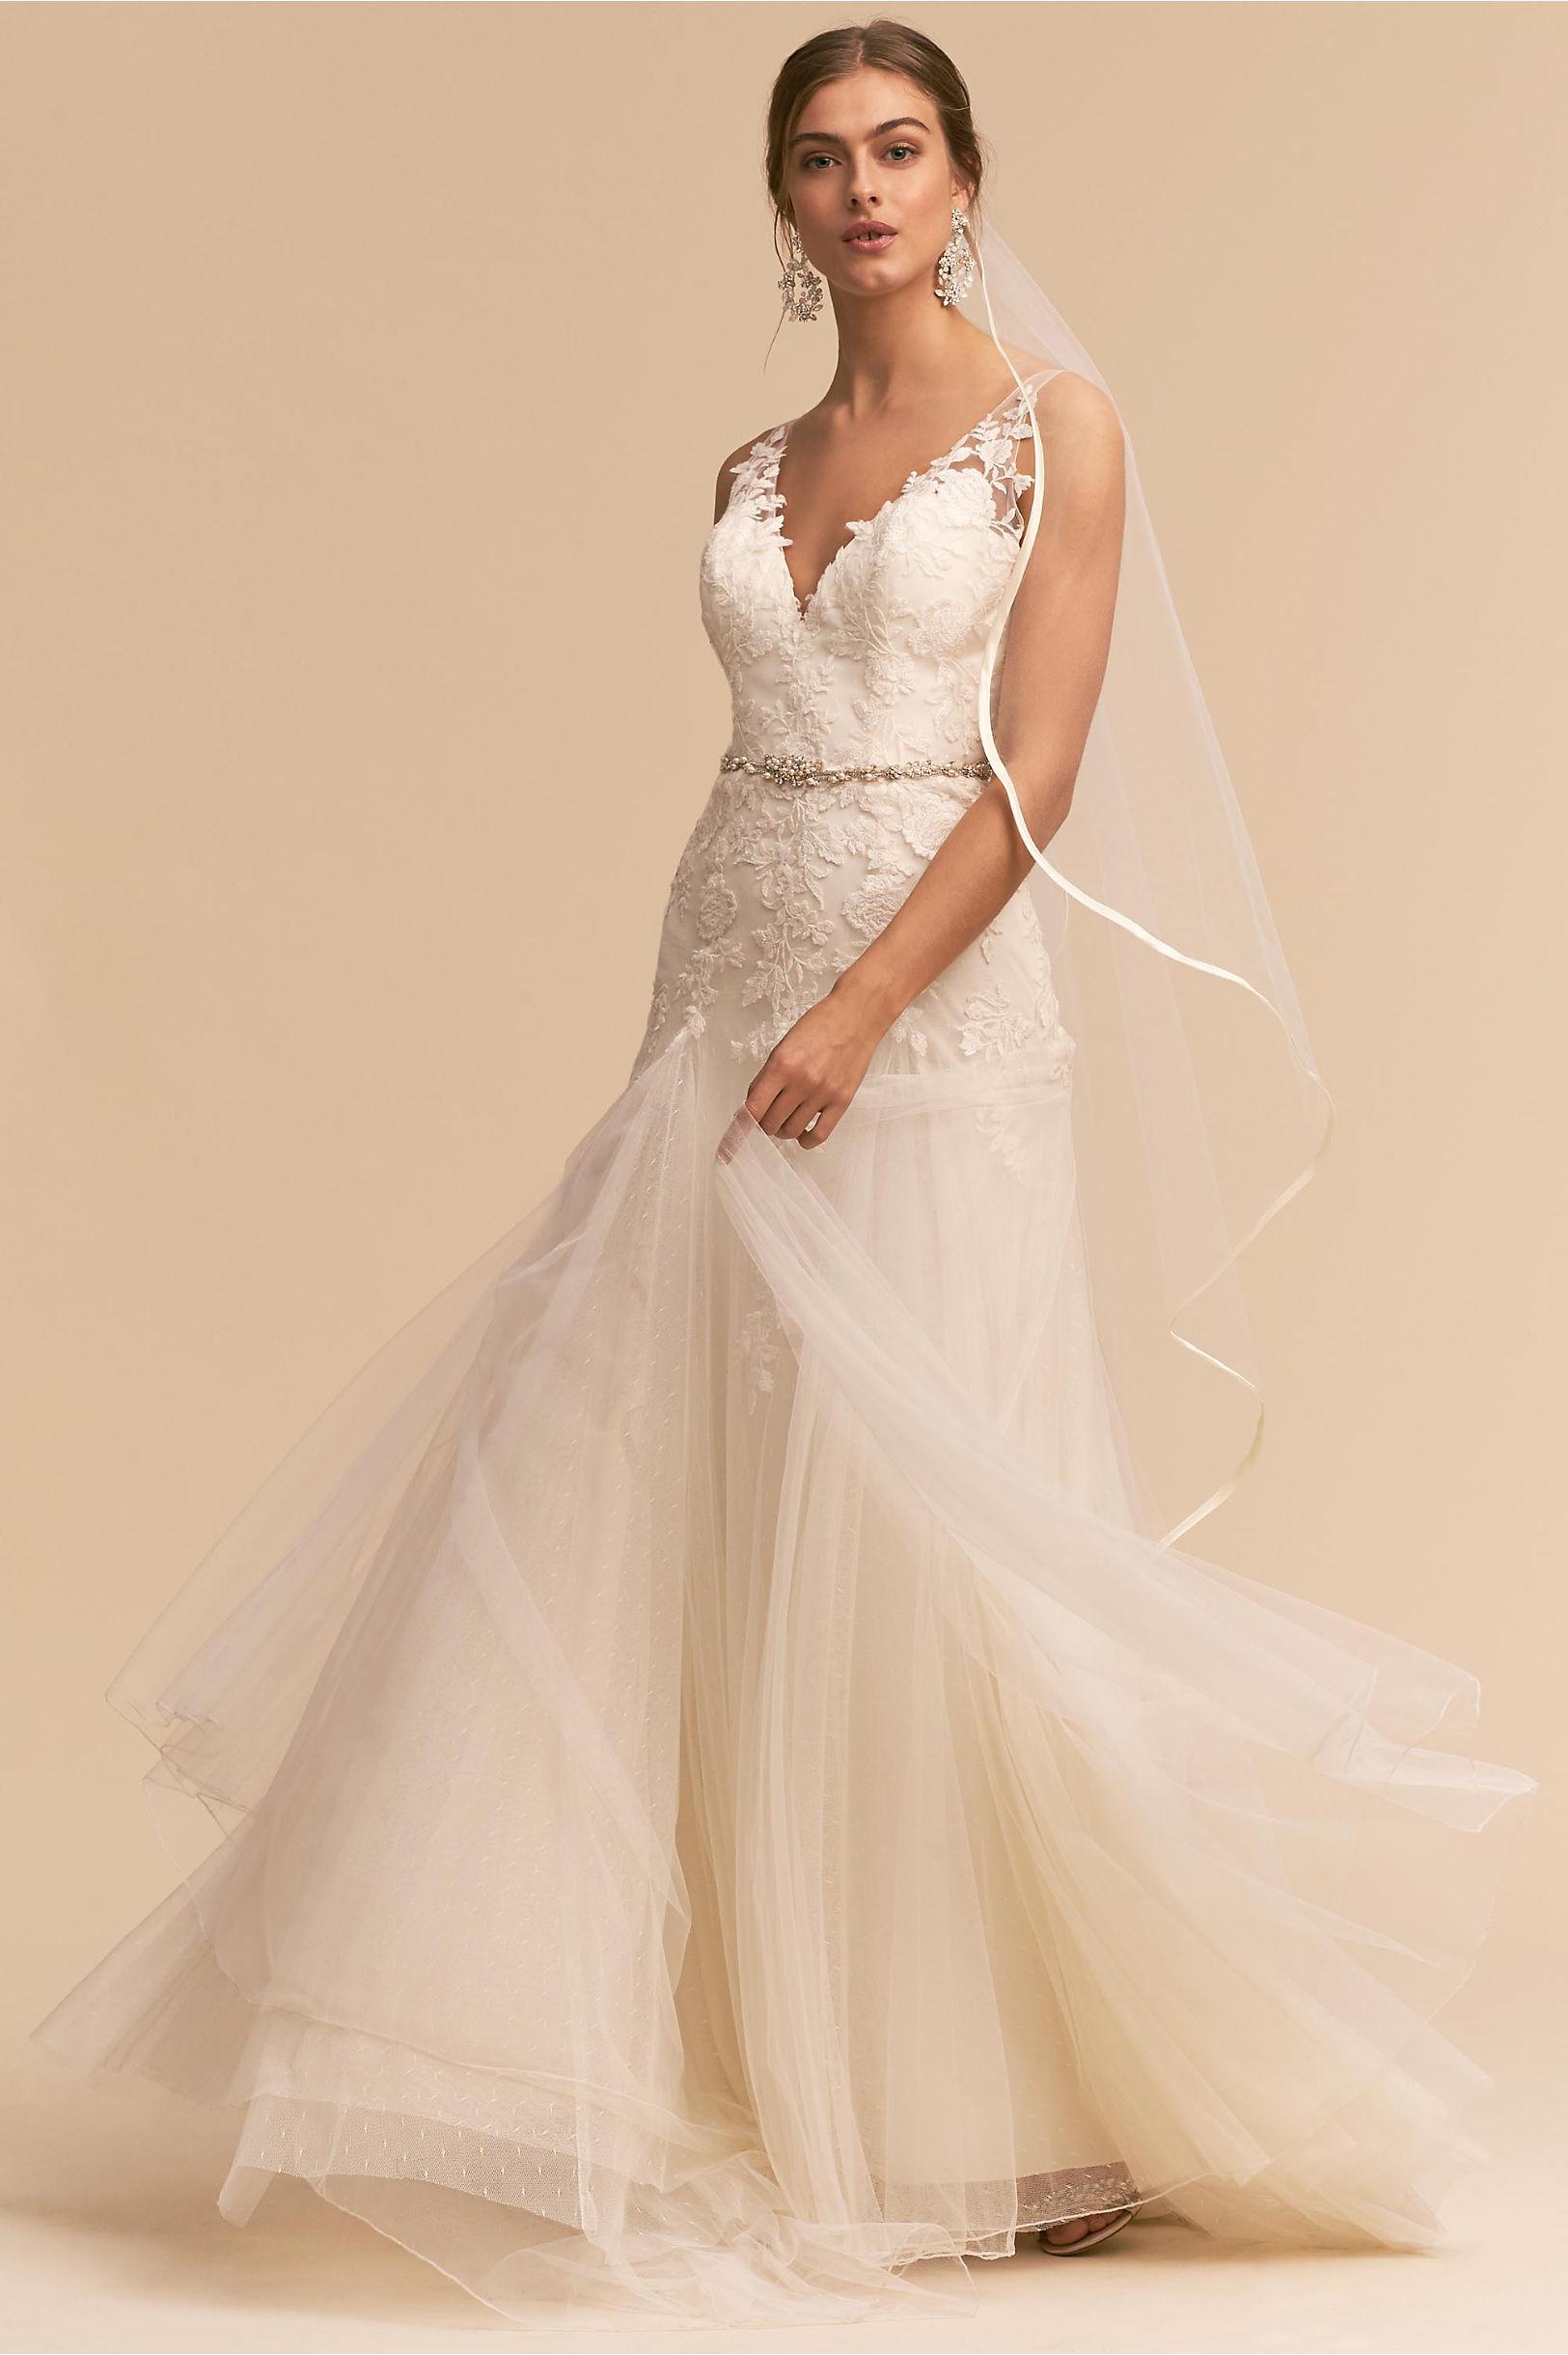 Soulmate Gown Ivory in Bride | BHLDN